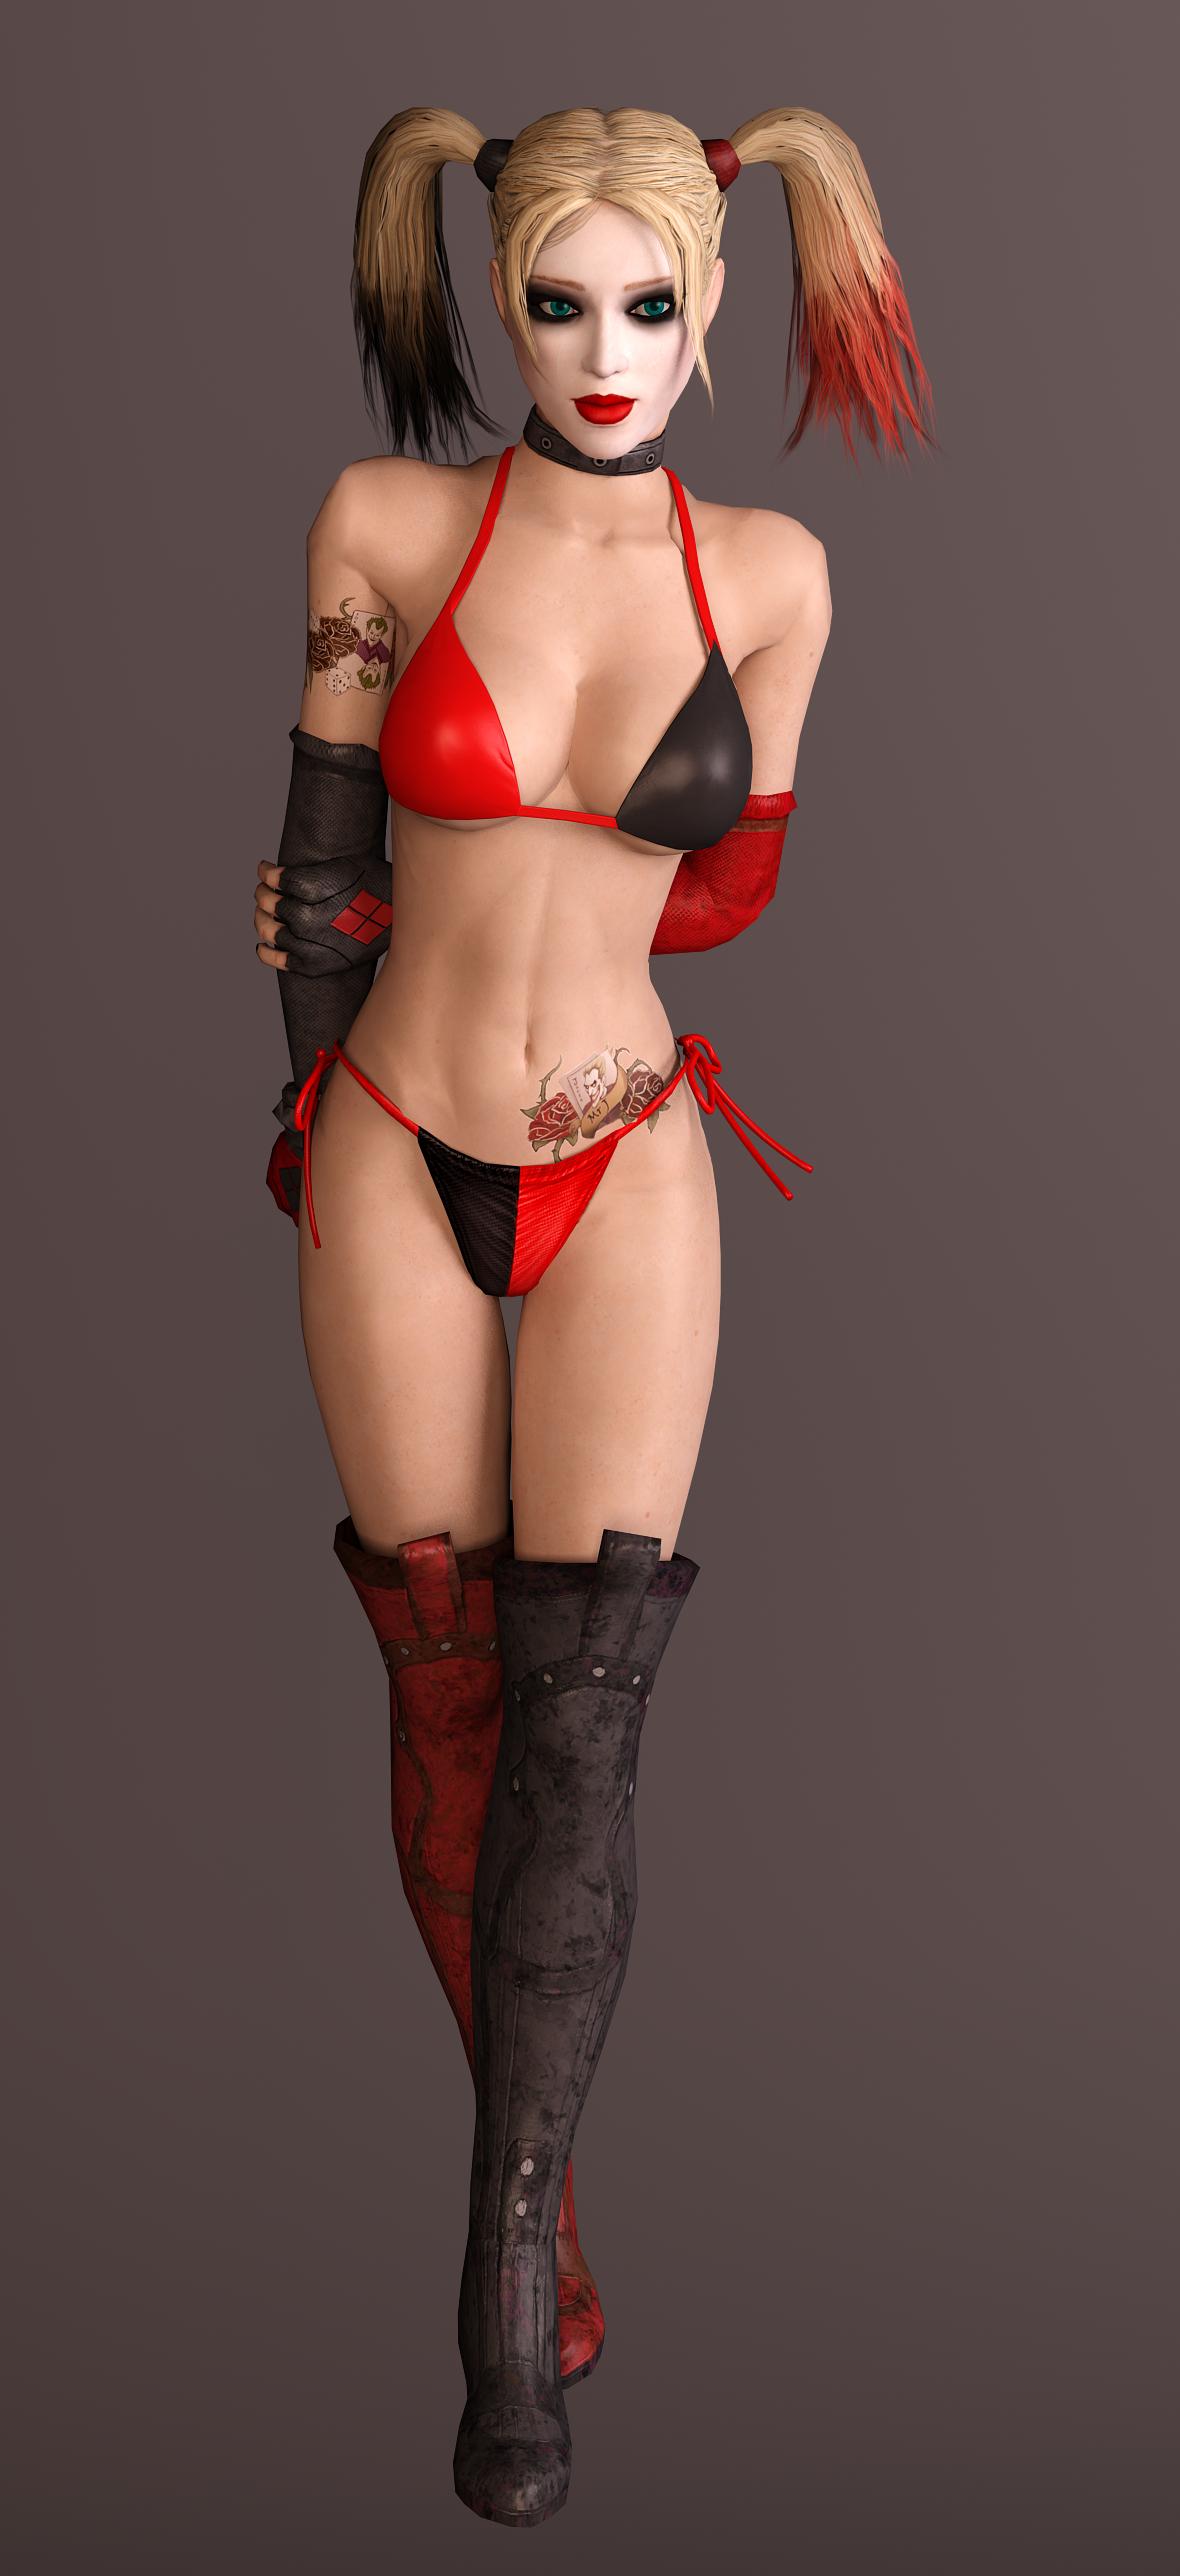 4134b1cb788e2 Harley Quinn - Bikini 02 by dnxpunk.deviantart.com on @DeviantArt ...